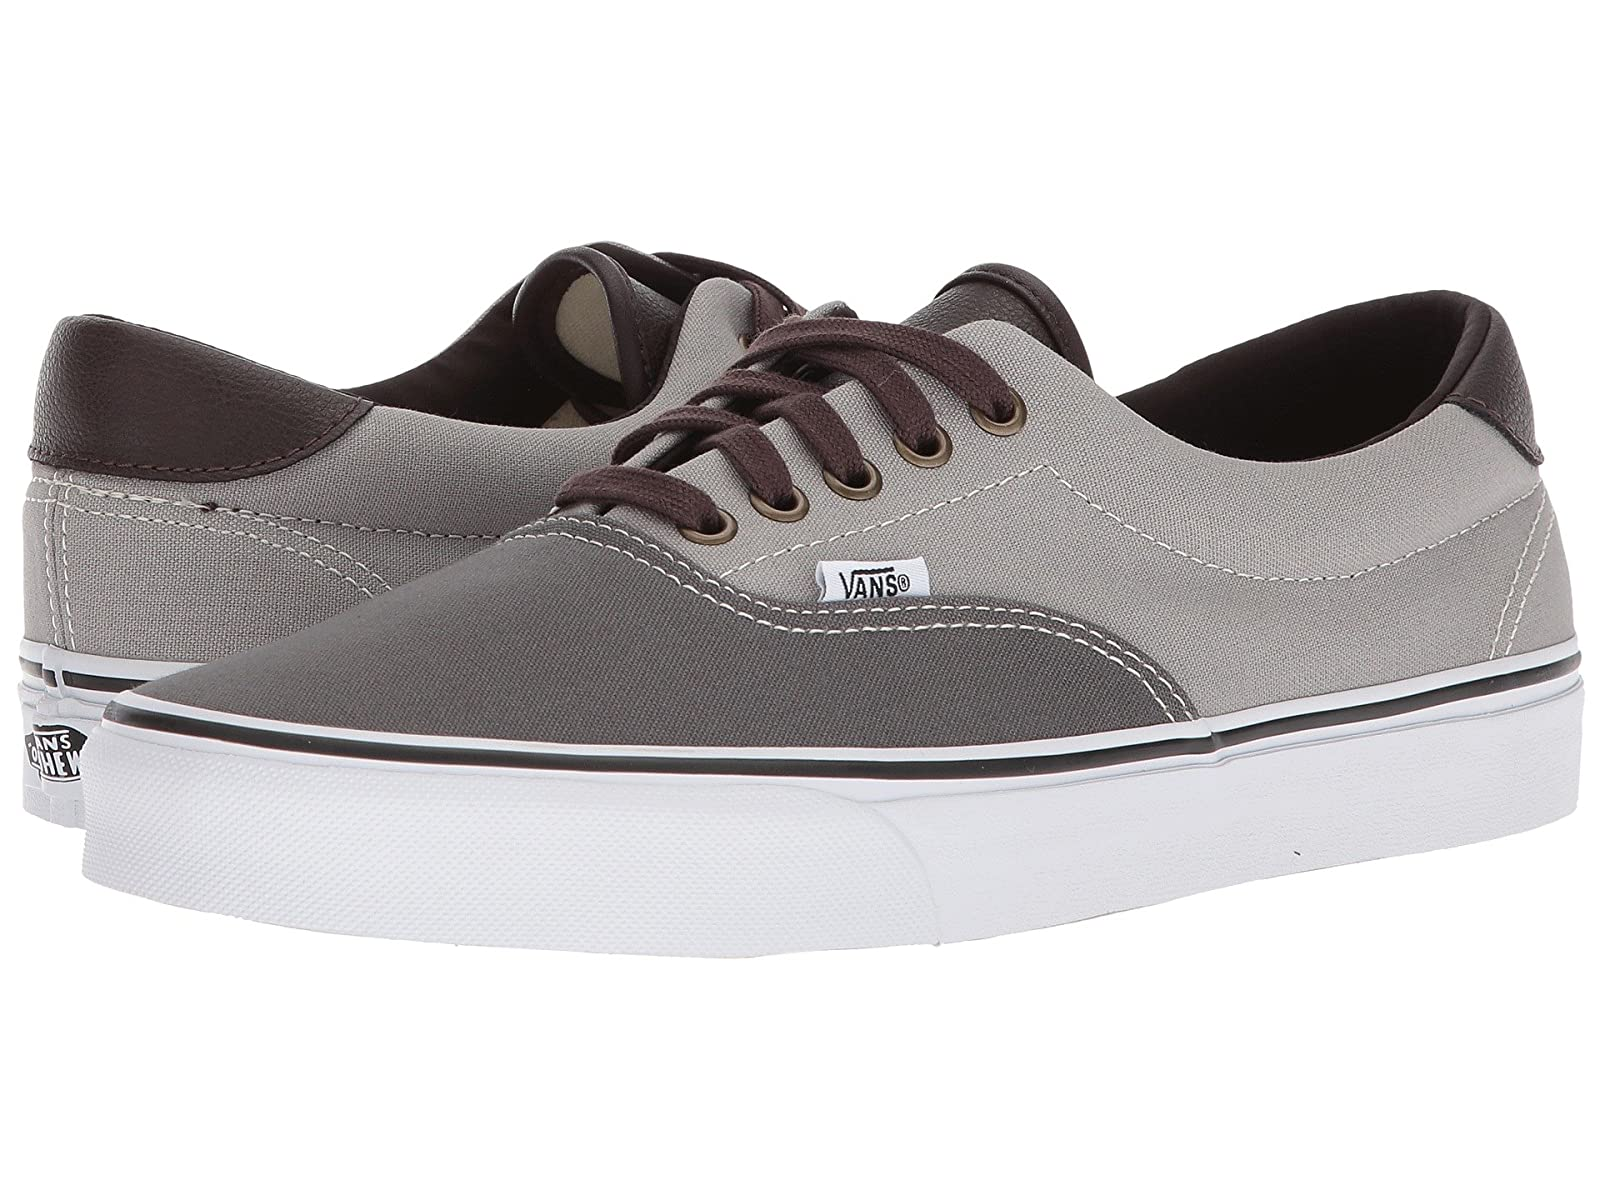 Vans Era 59Atmospheric grades have affordable shoes